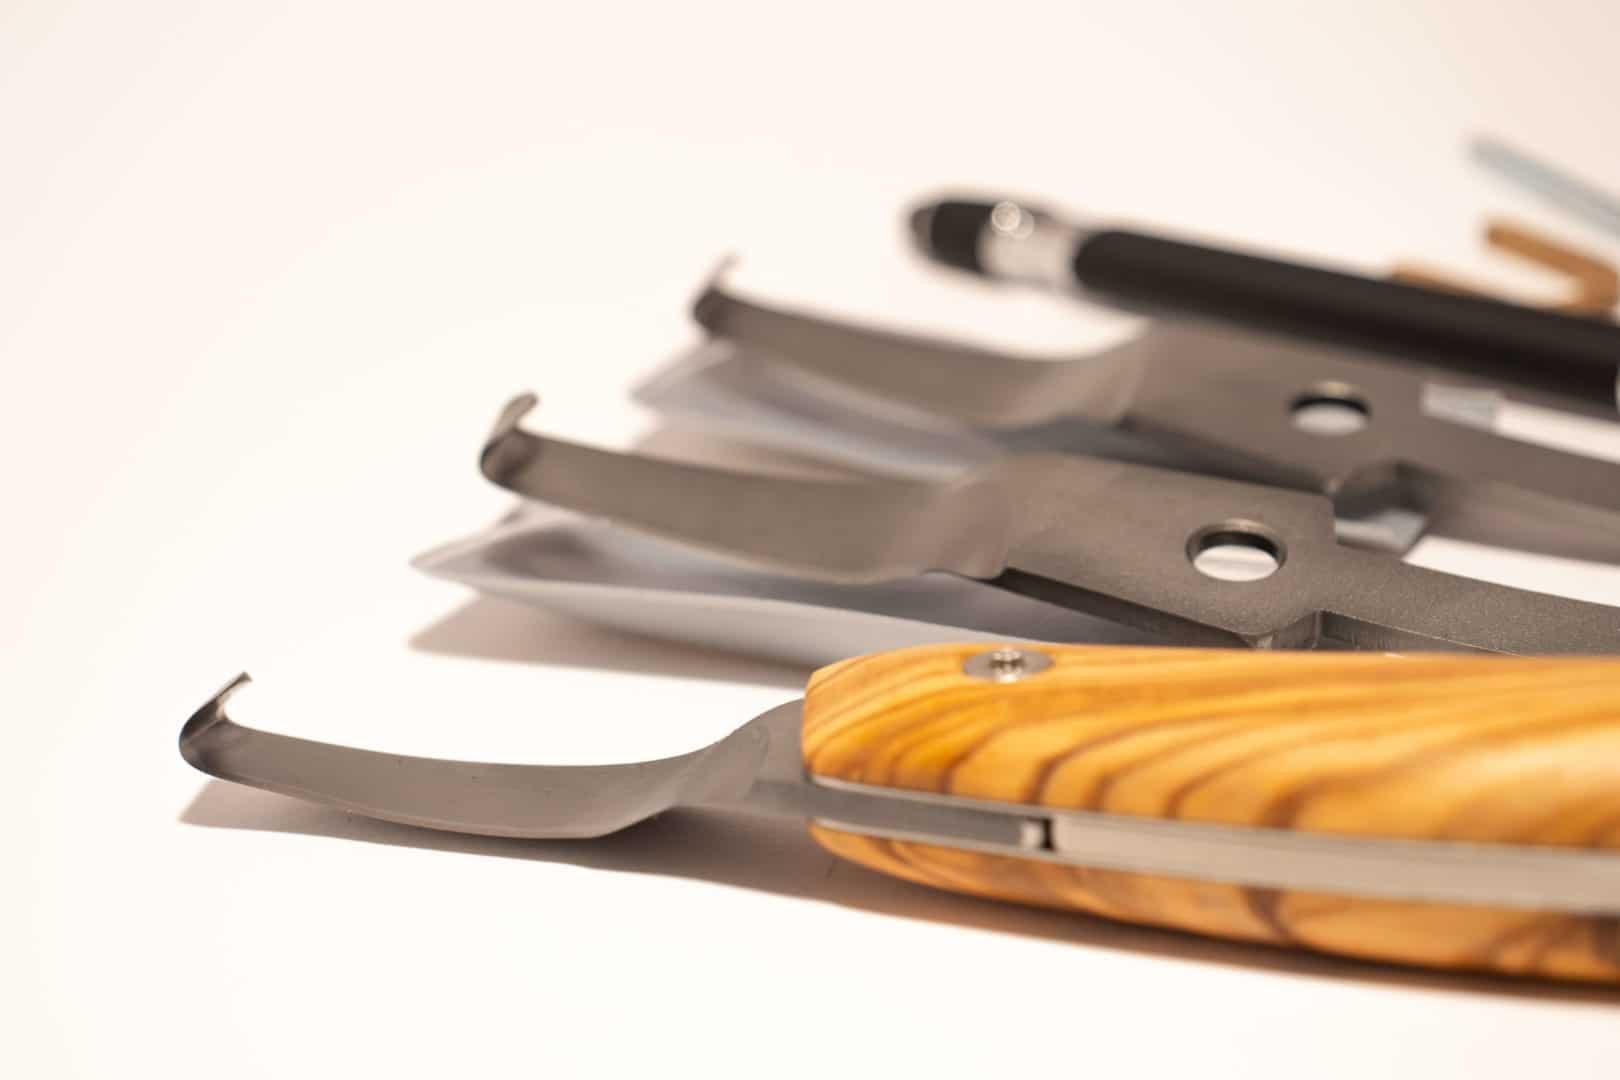 Luwex Drop Blade Set - Blade Handle Close Up